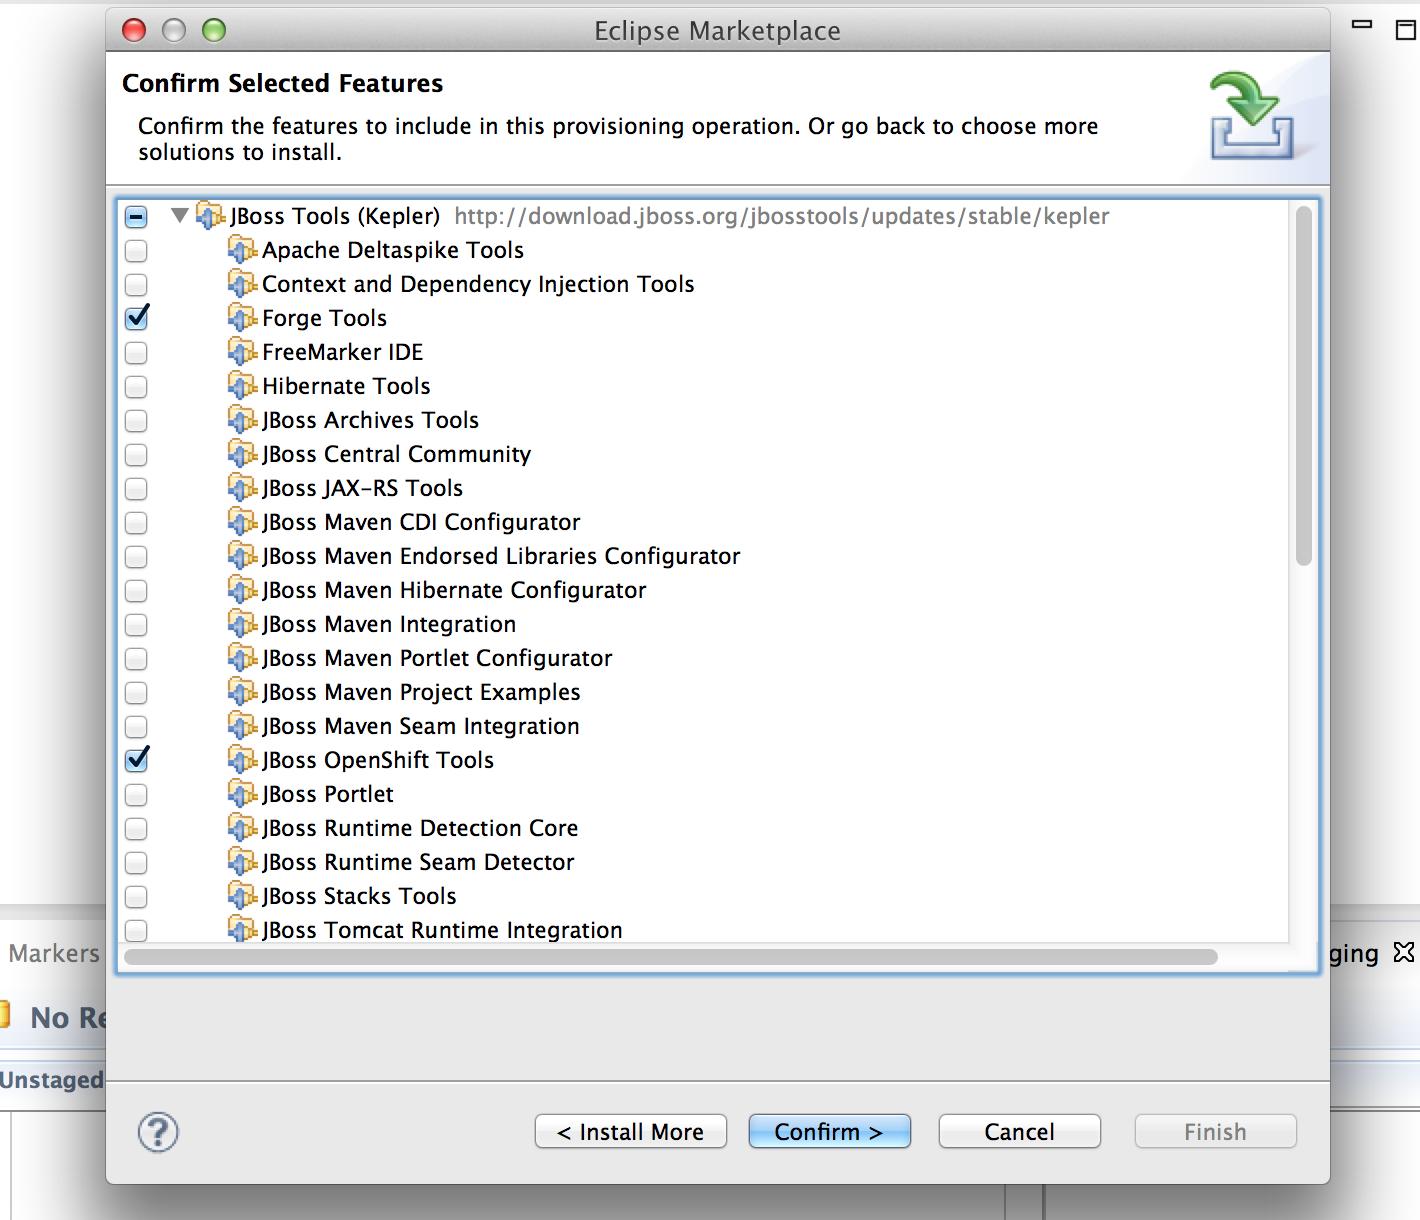 Select JBoss OpenShift Tools